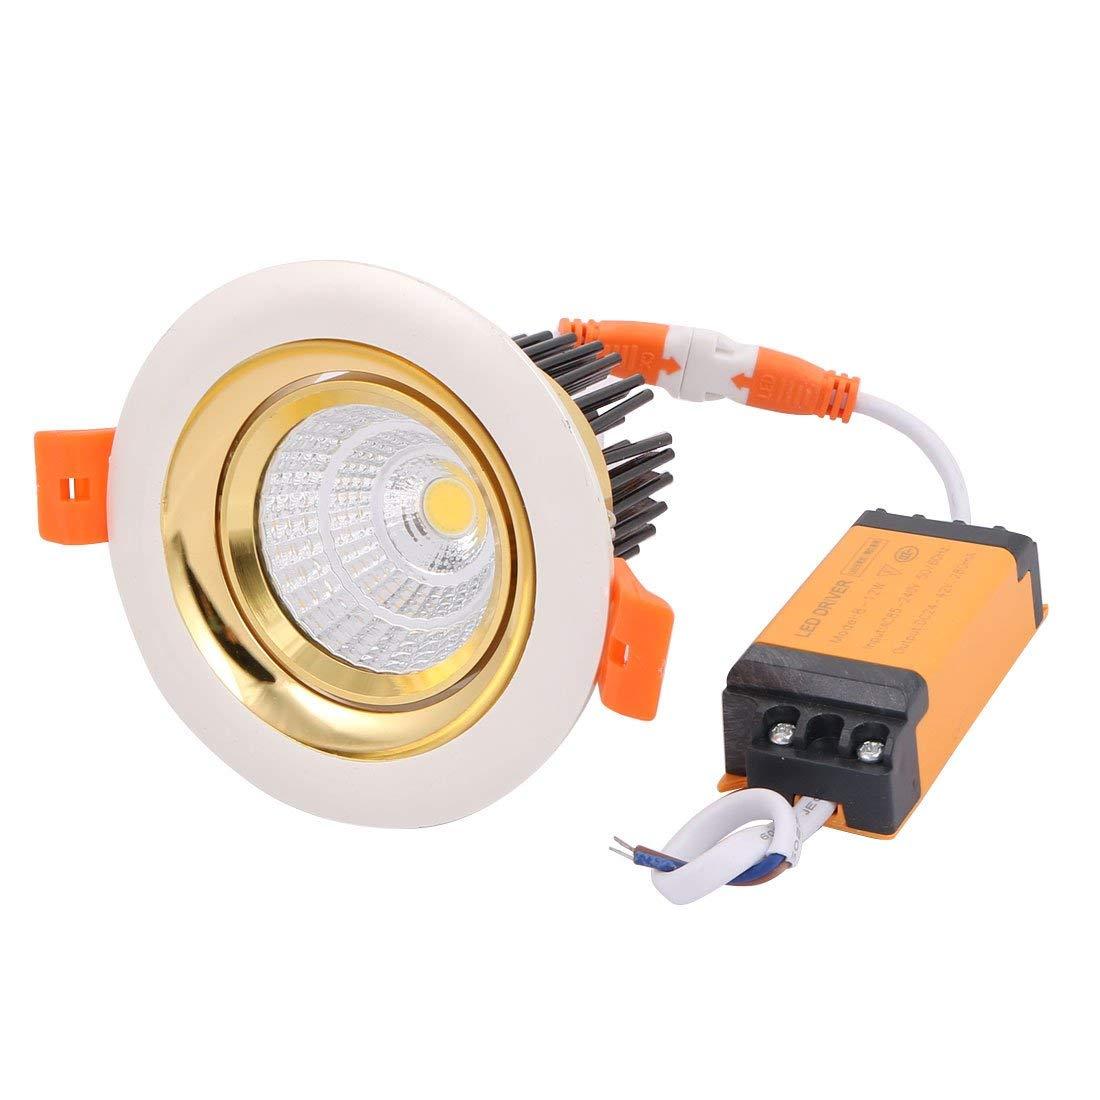 uxcell AC85-240V 10W COB LED Ceiling Spotlight Lighting Lamp Downlight Recessed w Driver 4000K